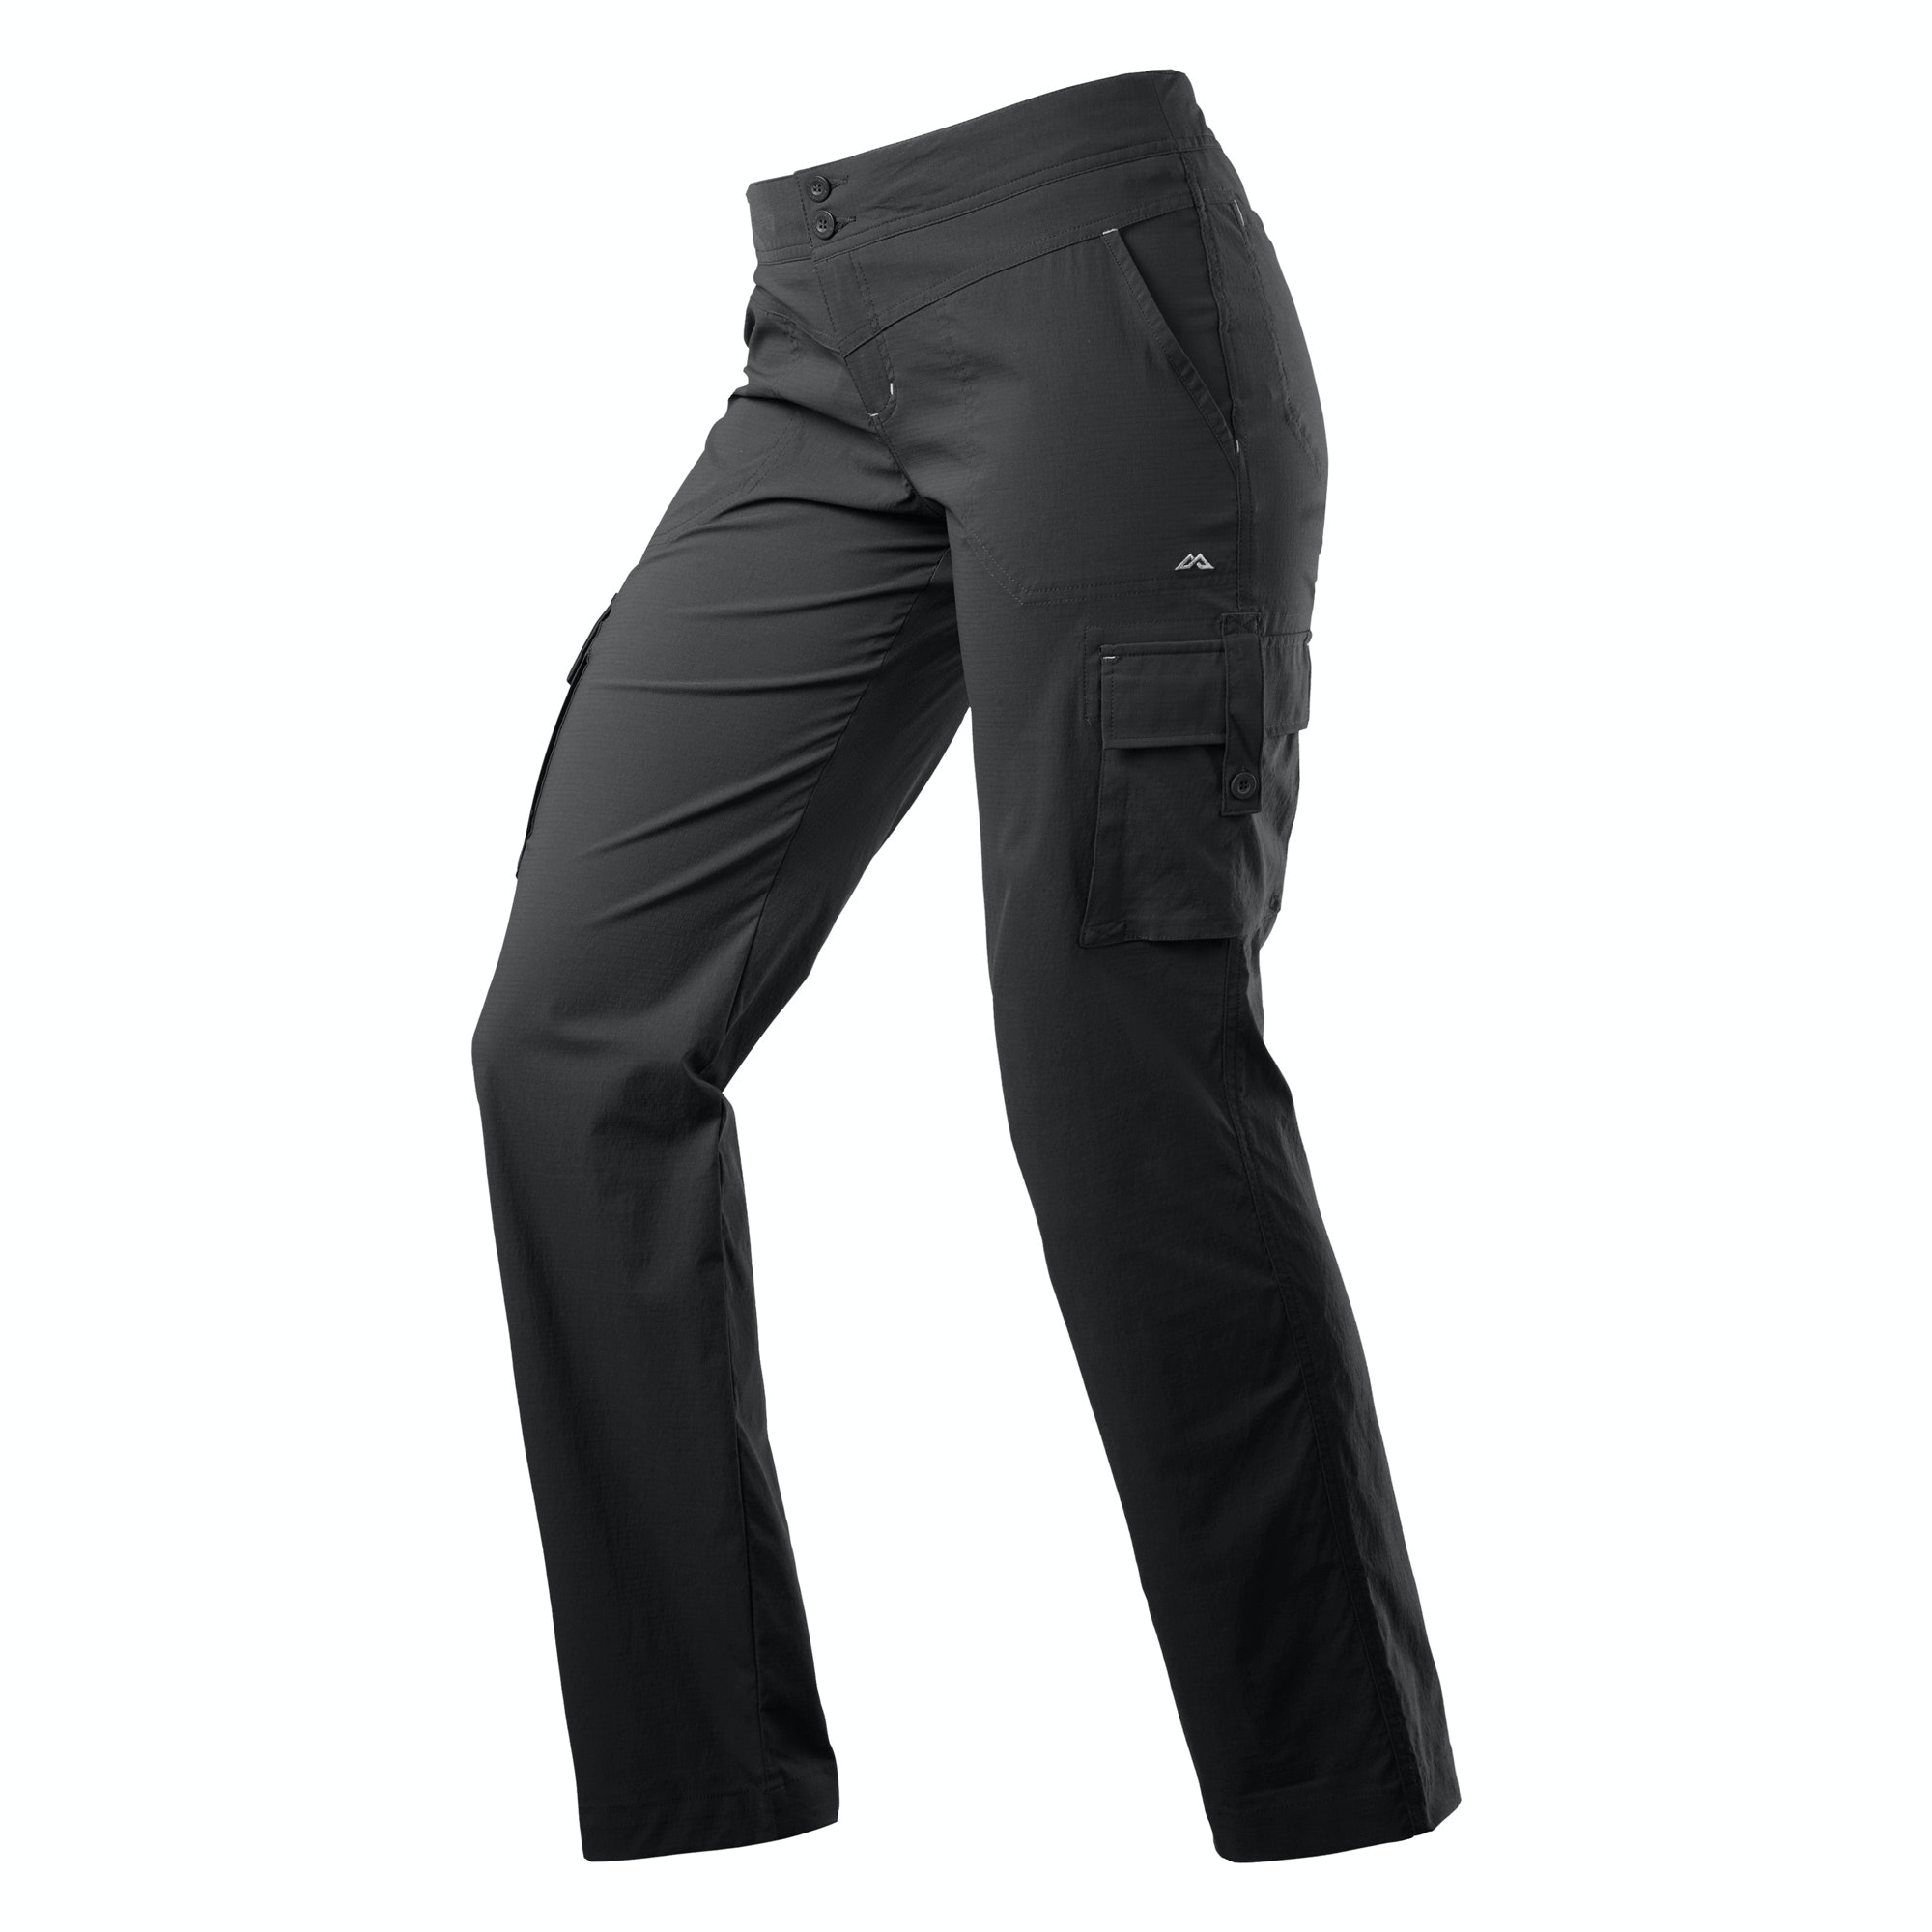 NEW-Kathmandu-Miro-Women-039-s-quickDRY-Pants-Trousers-Stretch-Travel-Cargo-Recycled thumbnail 10